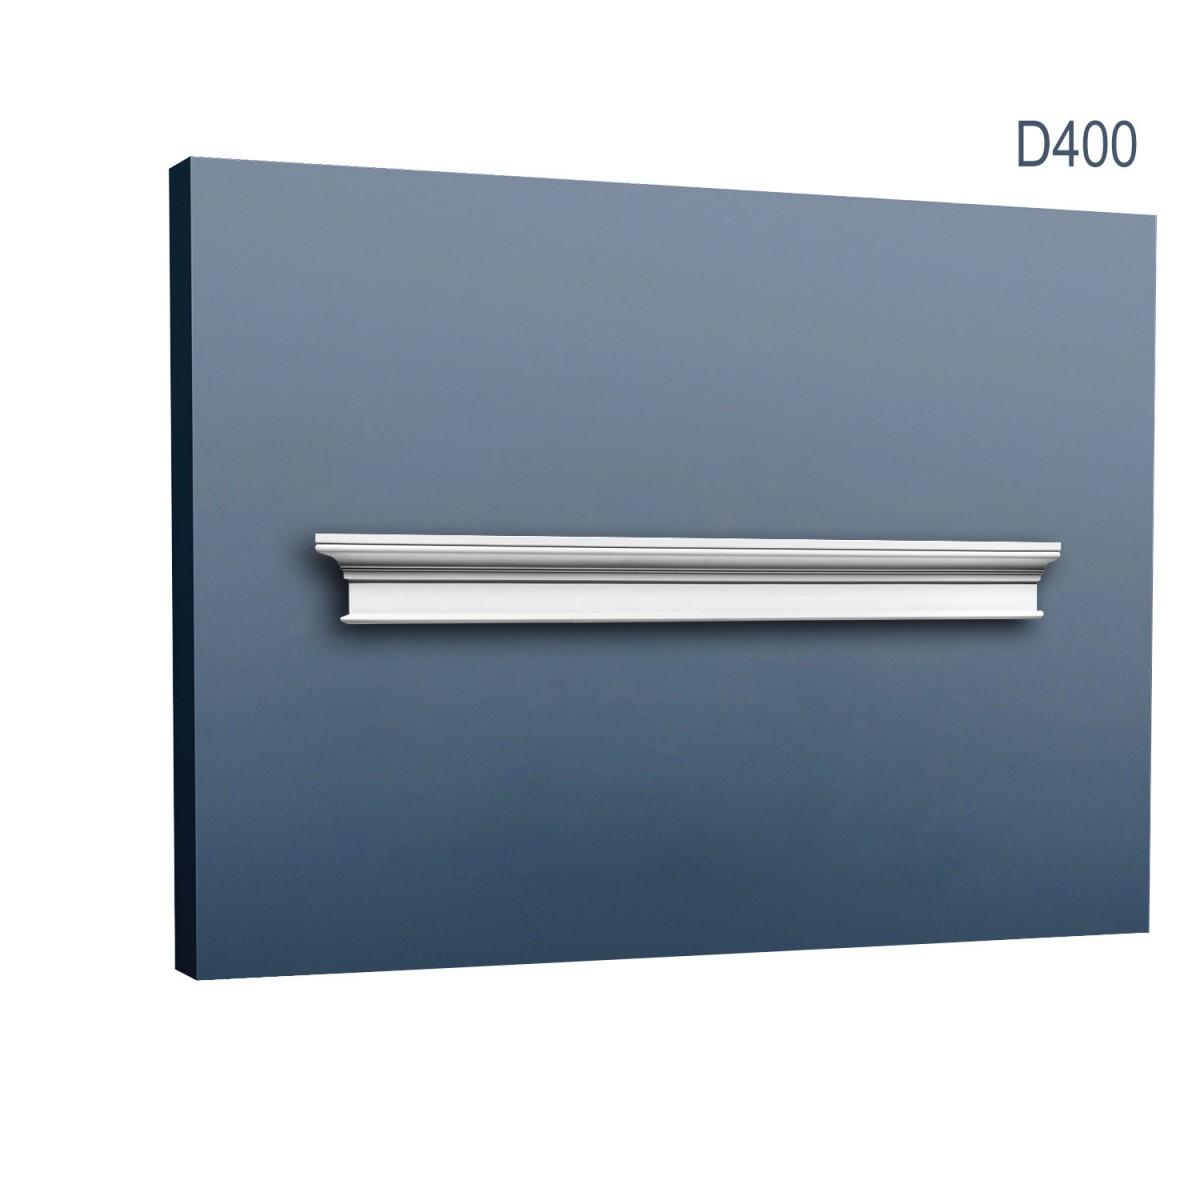 Fronton Luxxus D400, Dimensiuni: 127.5 X 14.7 X 5.9 cm, Orac Decor